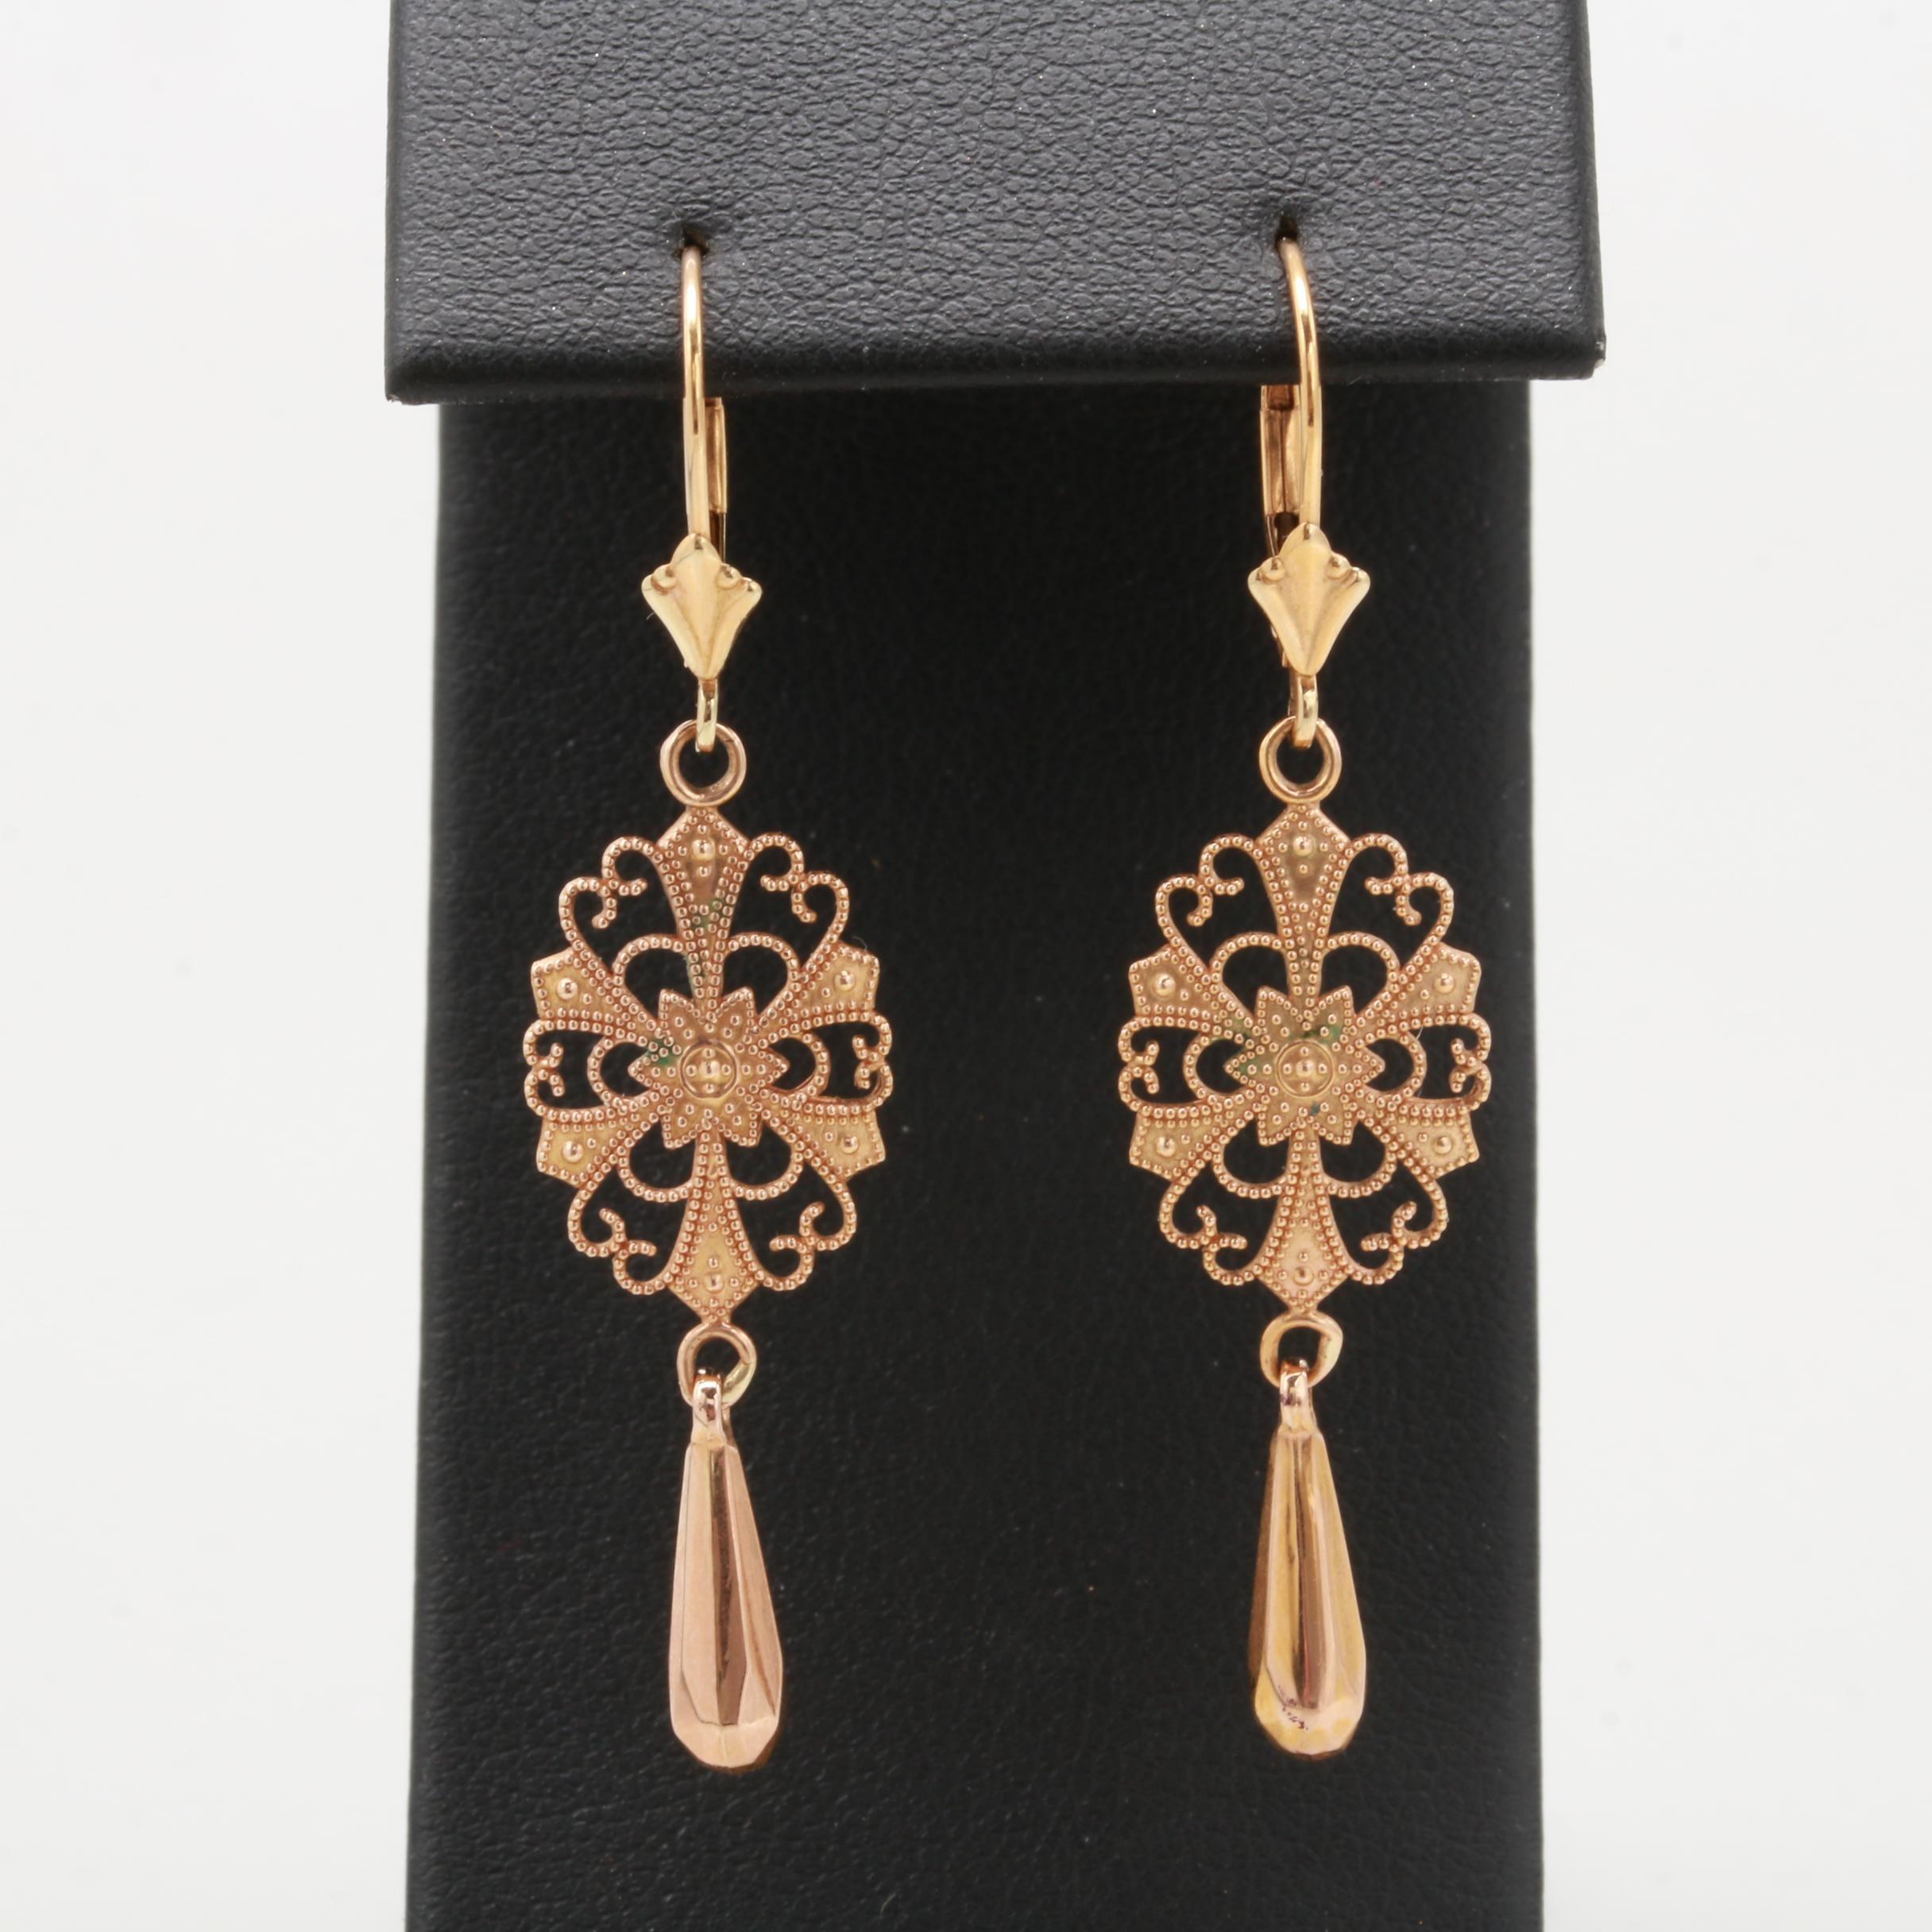 Michael Anthony 14K Yellow Gold Dangle Earrings